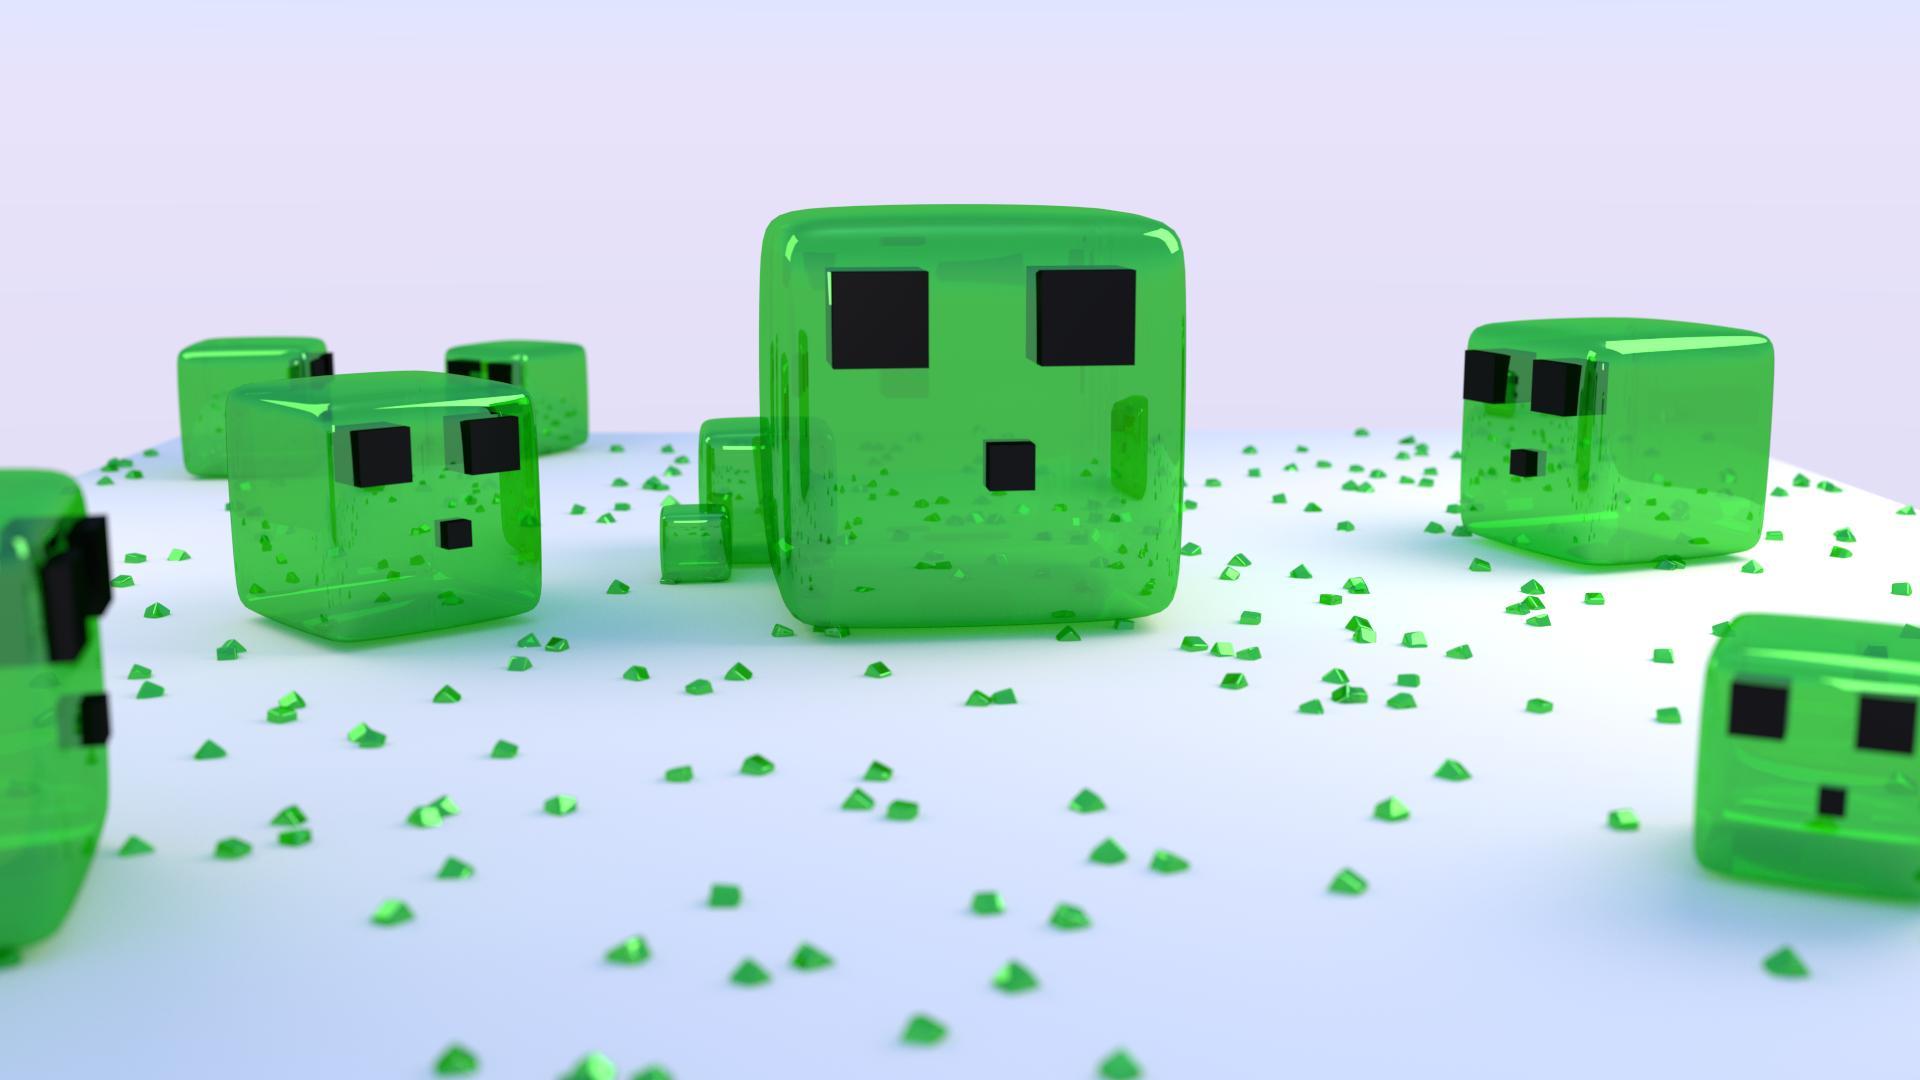 Plano De Fundo Minecraft: Vídeo Game Minecraft Papel De Parede